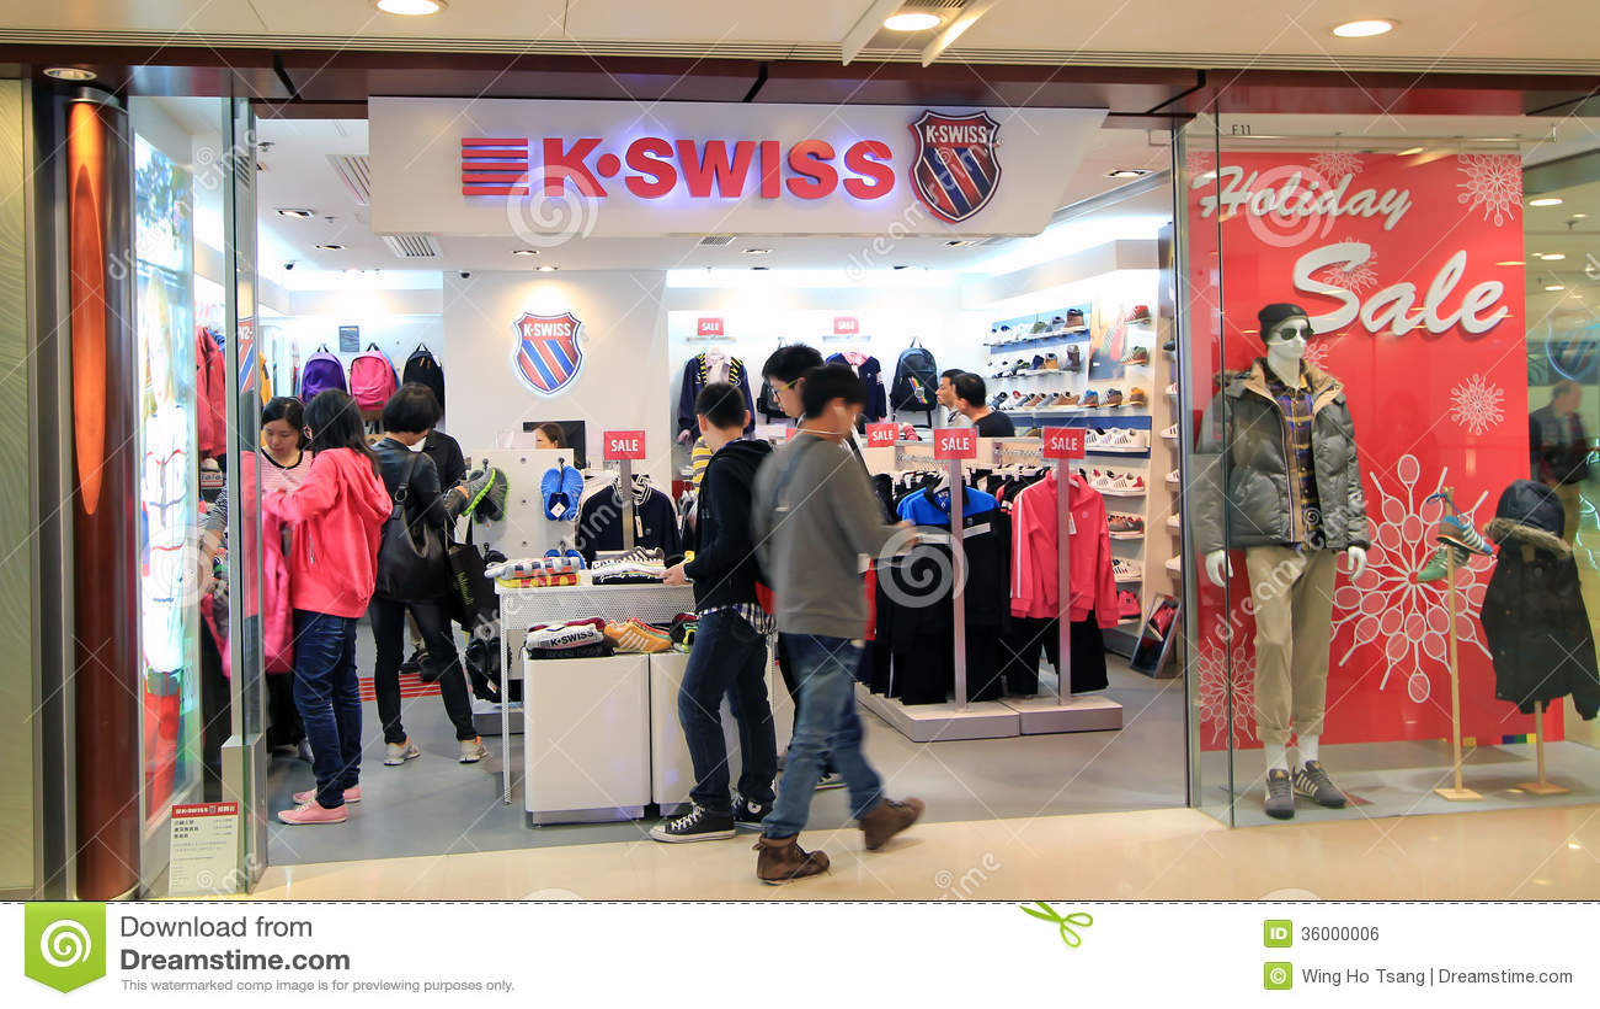 K swiss shop in Hong Kong editorial